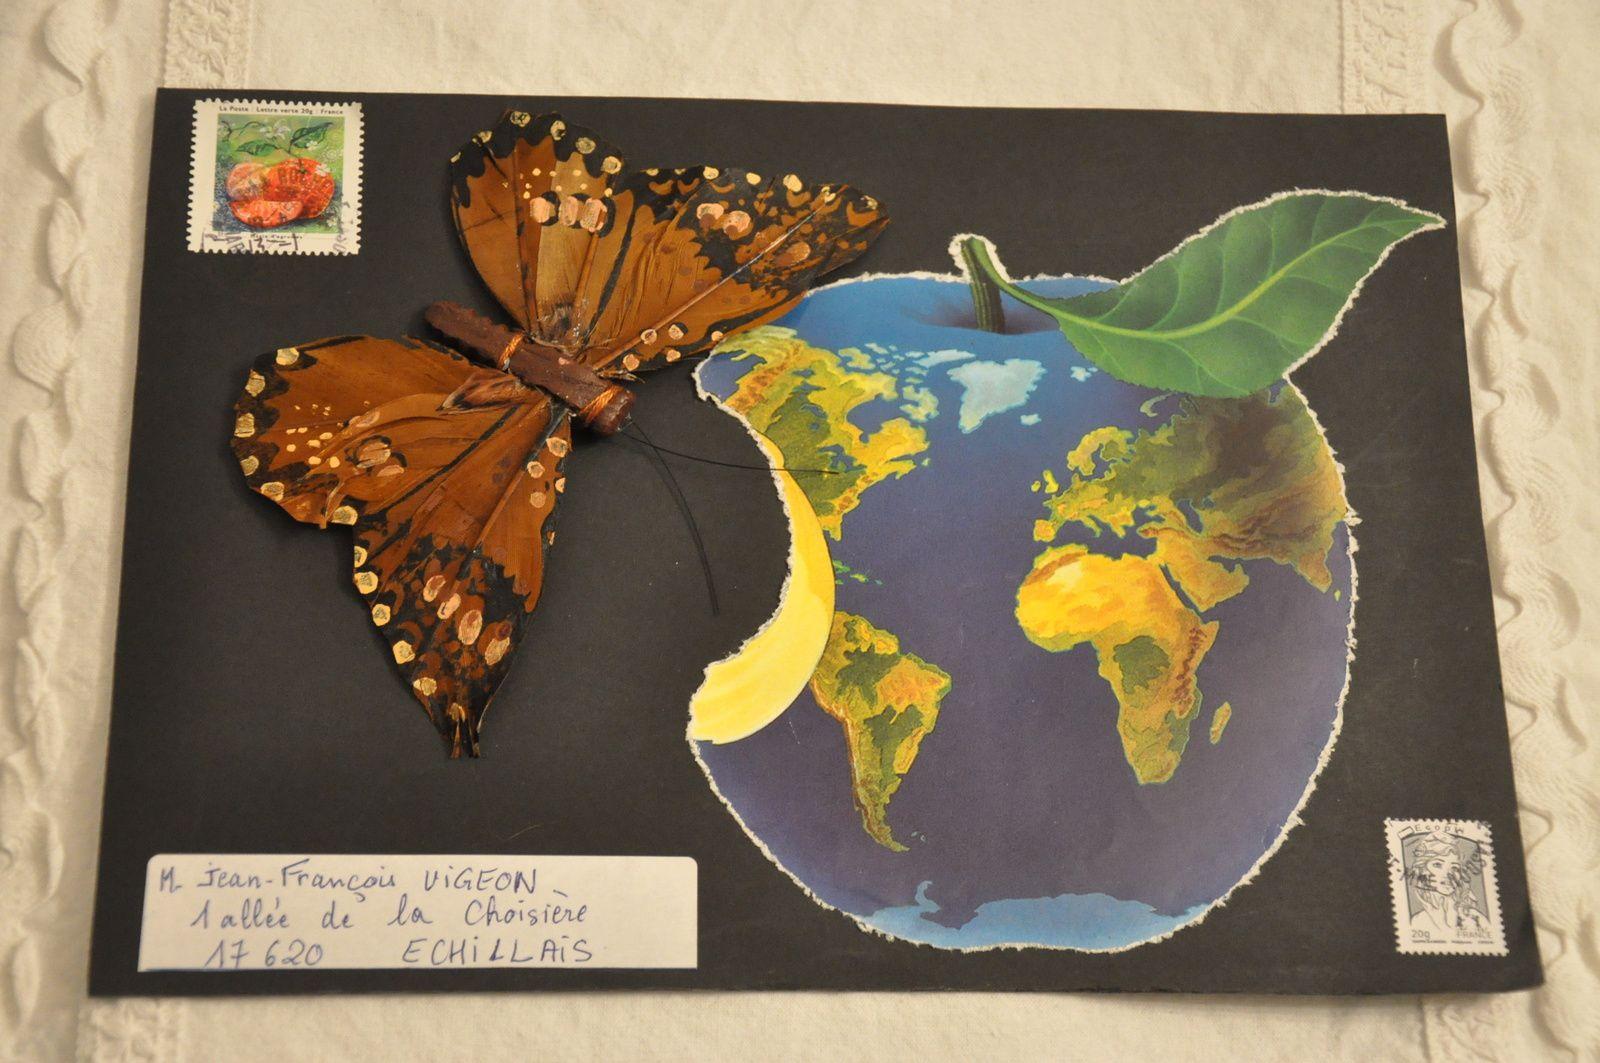 Reçu de Josiane Ruhaud ce magnifique papillon en volume! L'ARt postal, c'est vraiment génial! Merciiiiiiiii!